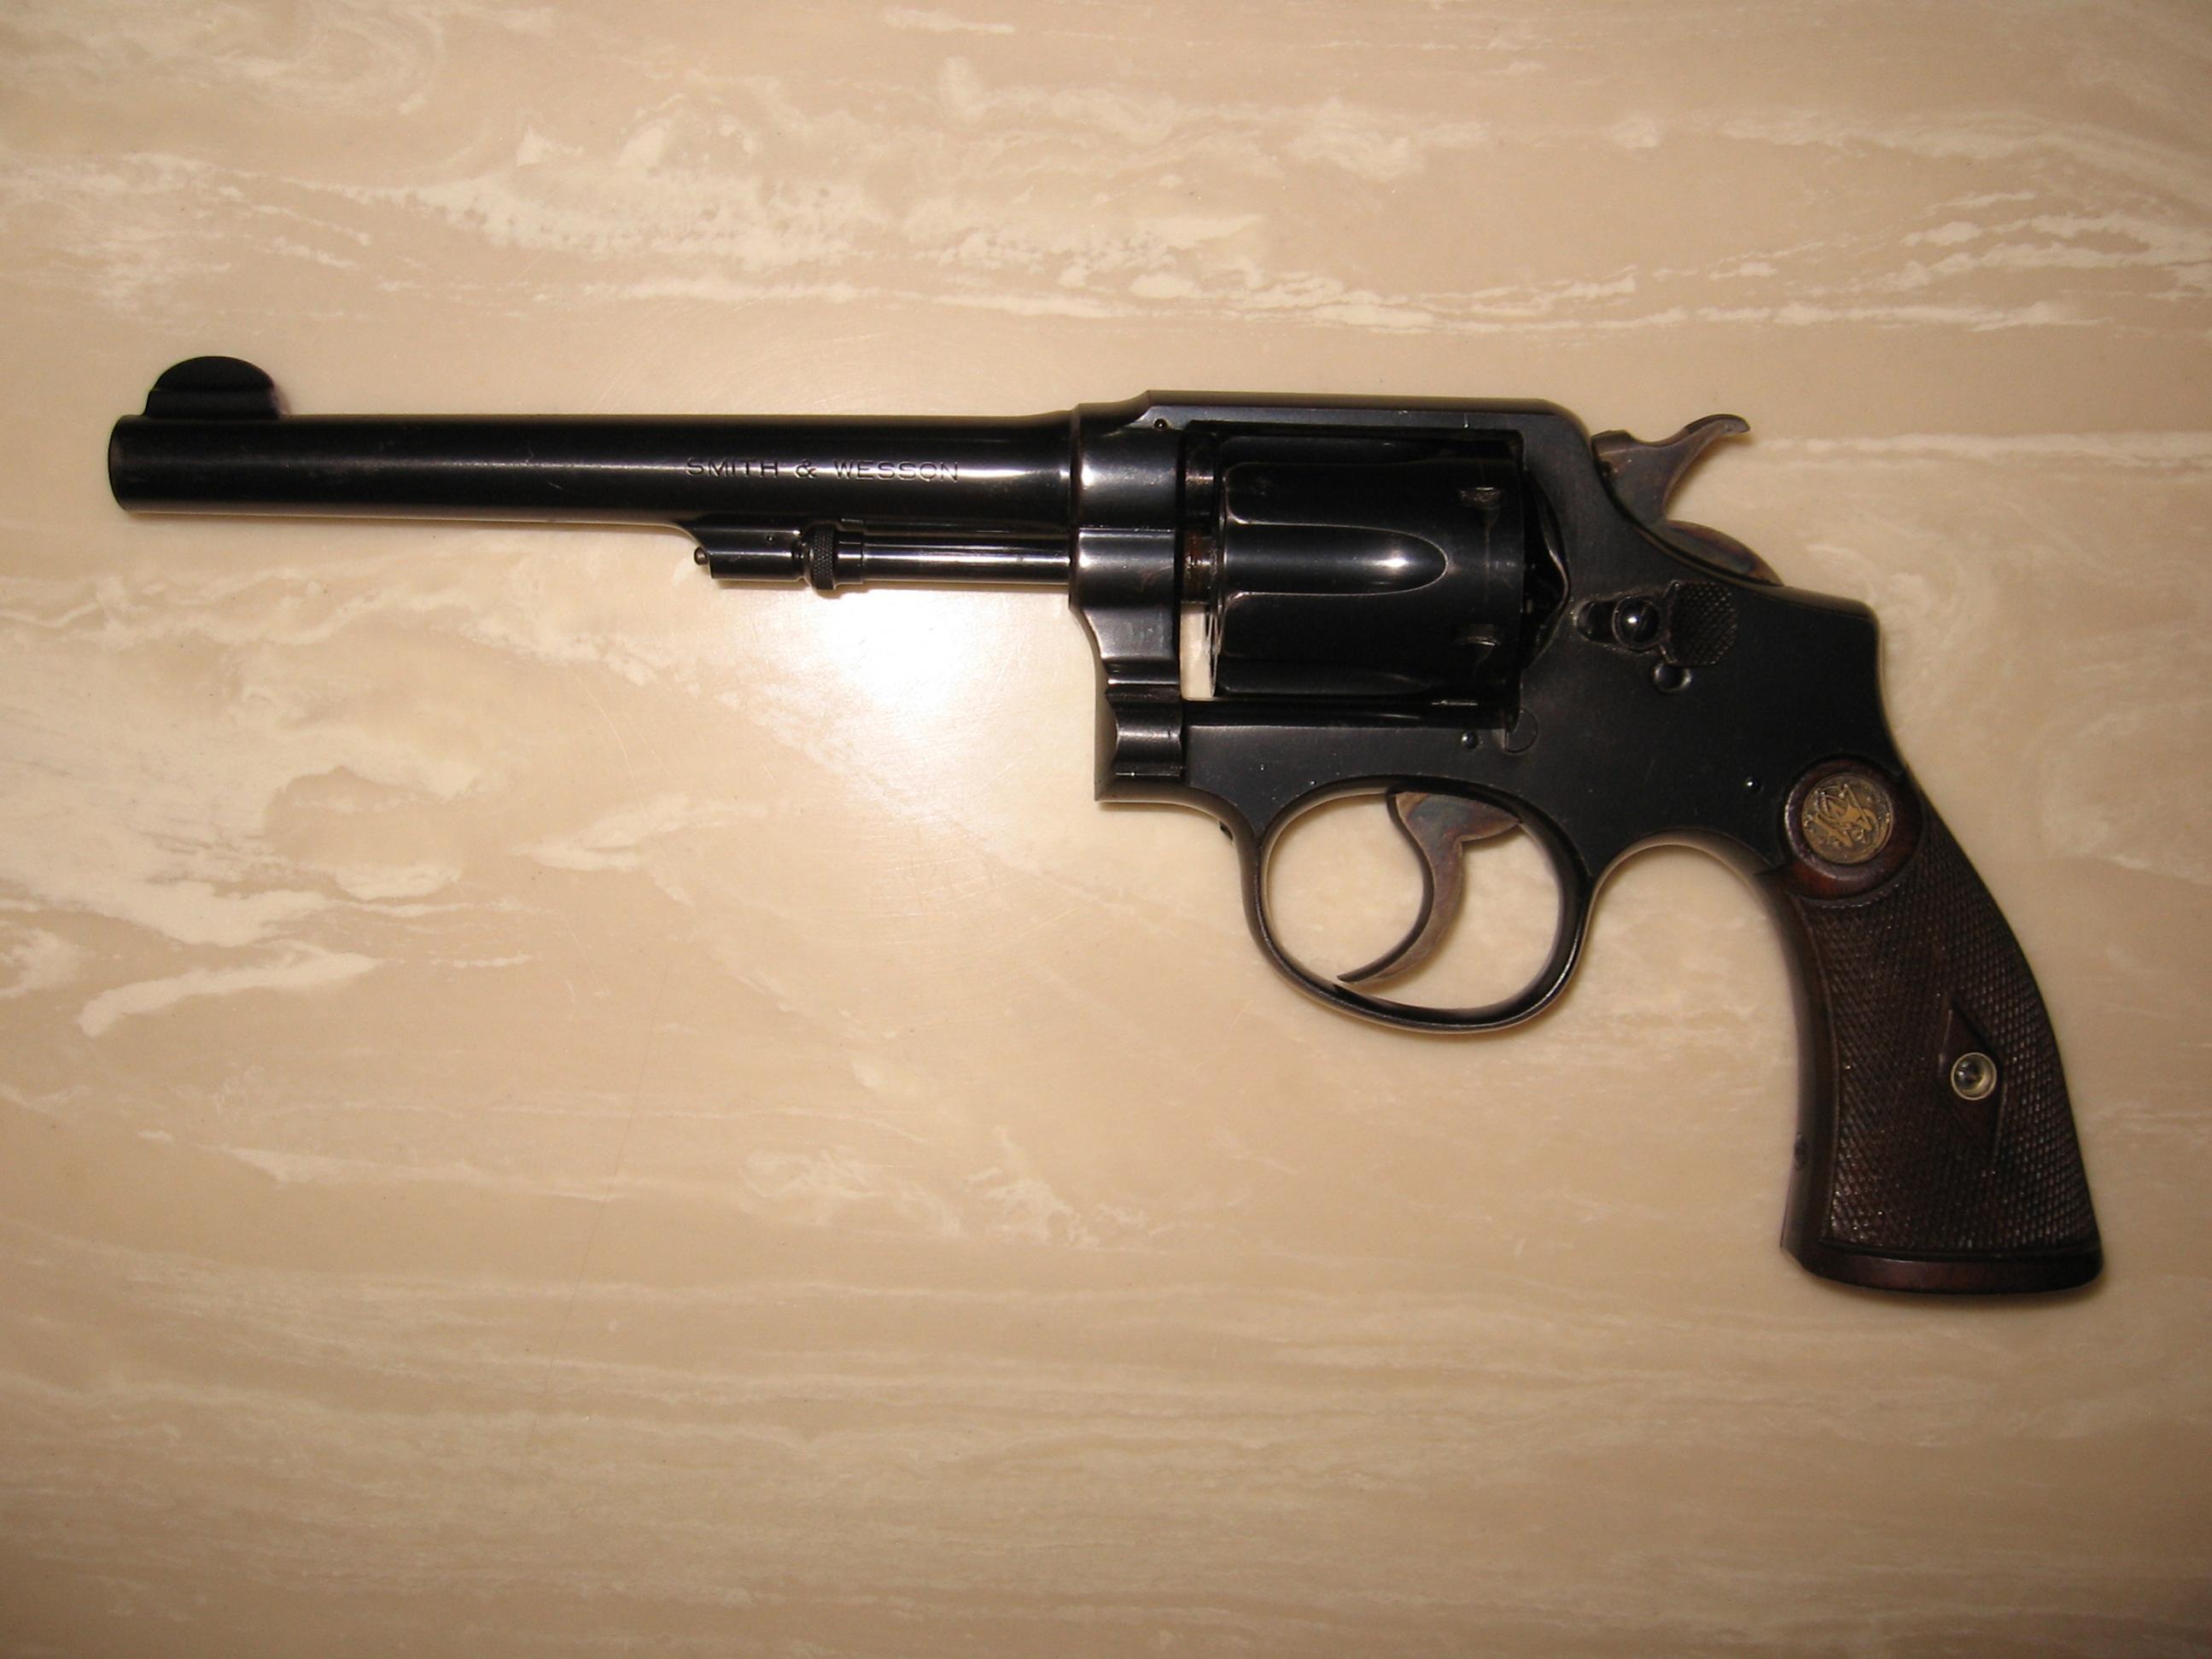 Please help identify these revolvers!-img_0639.jpg